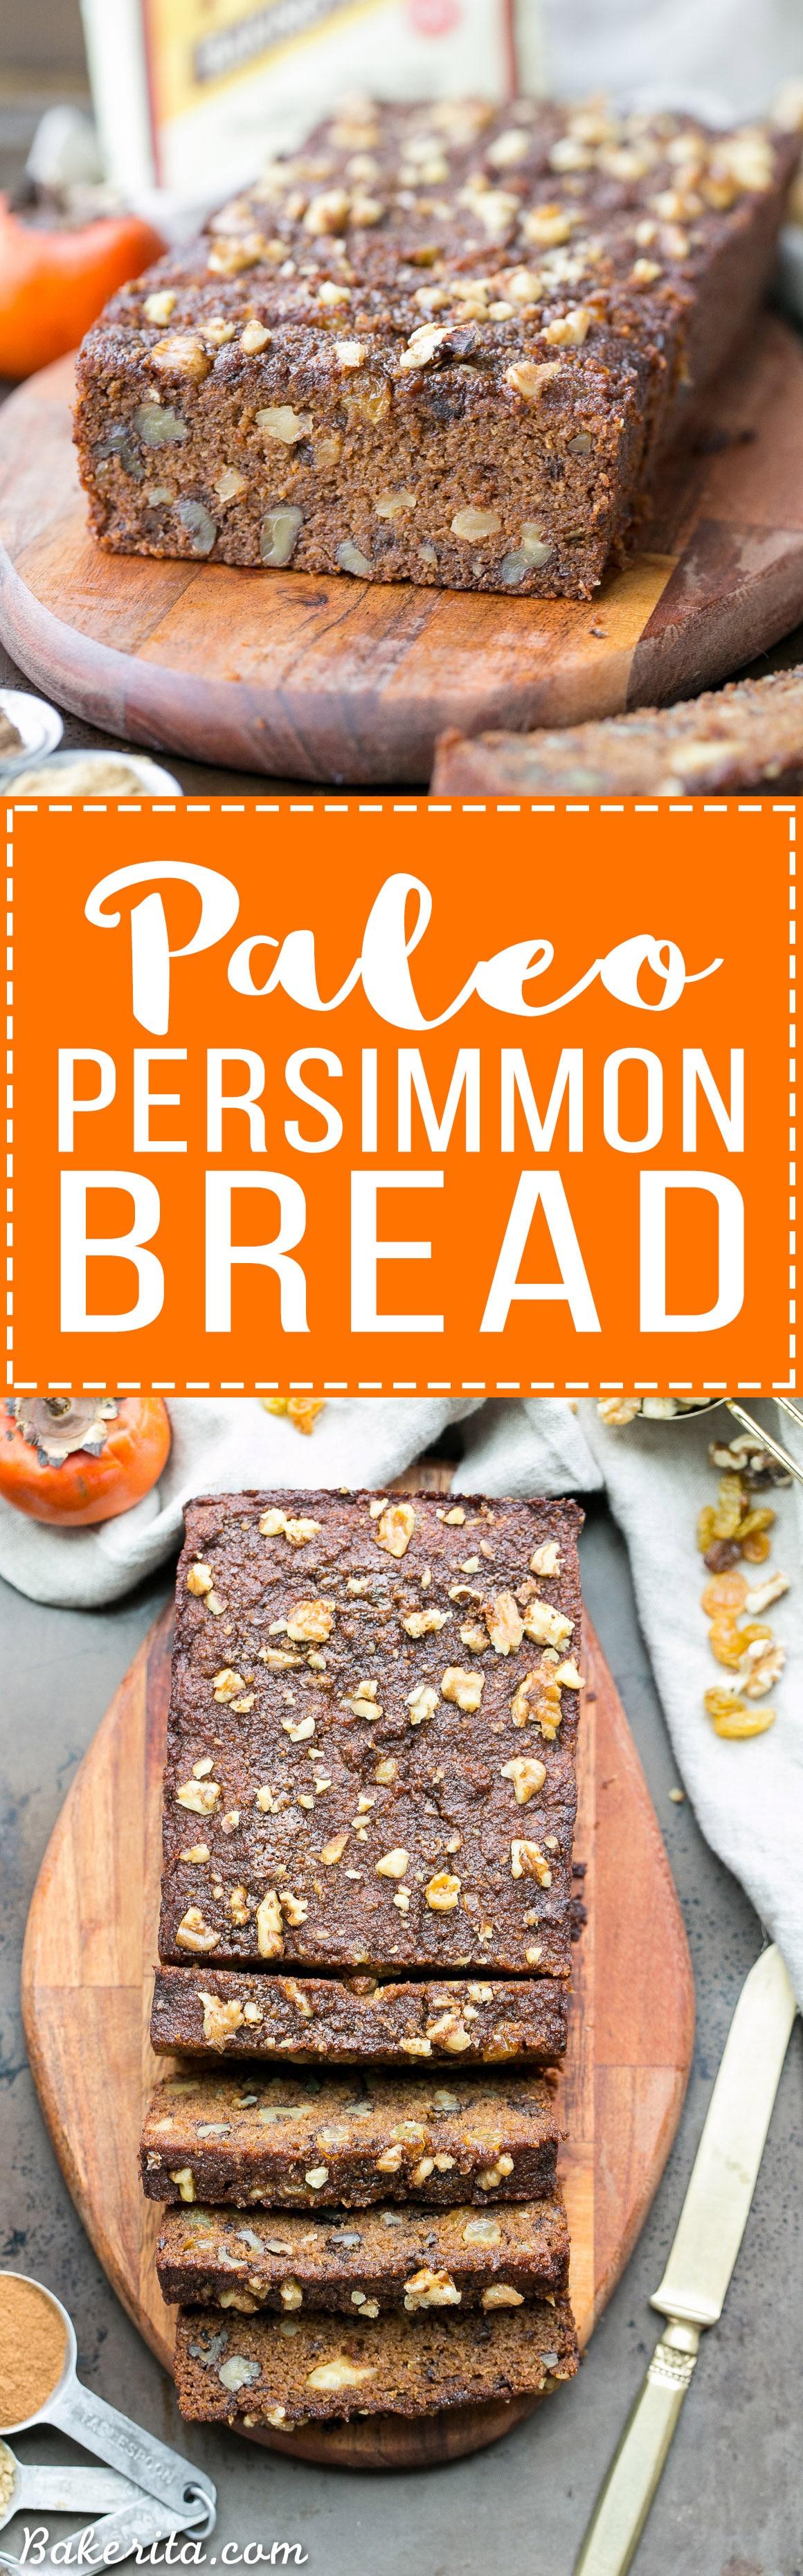 ... persimmon bread ginger persimmon bread joy persimmon bread persimmon